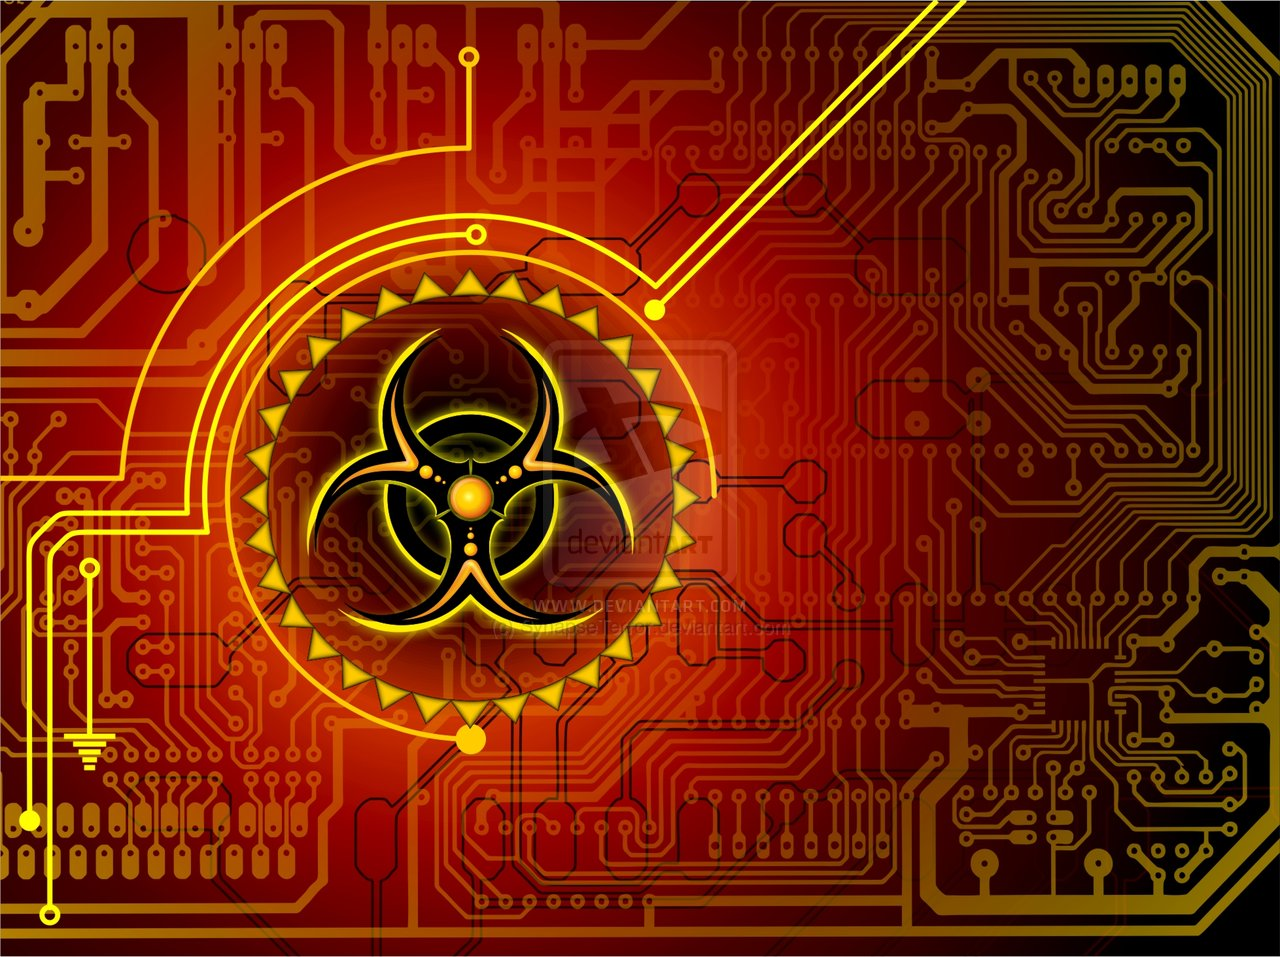 Biohazard Sign Wallpaper 1280x957